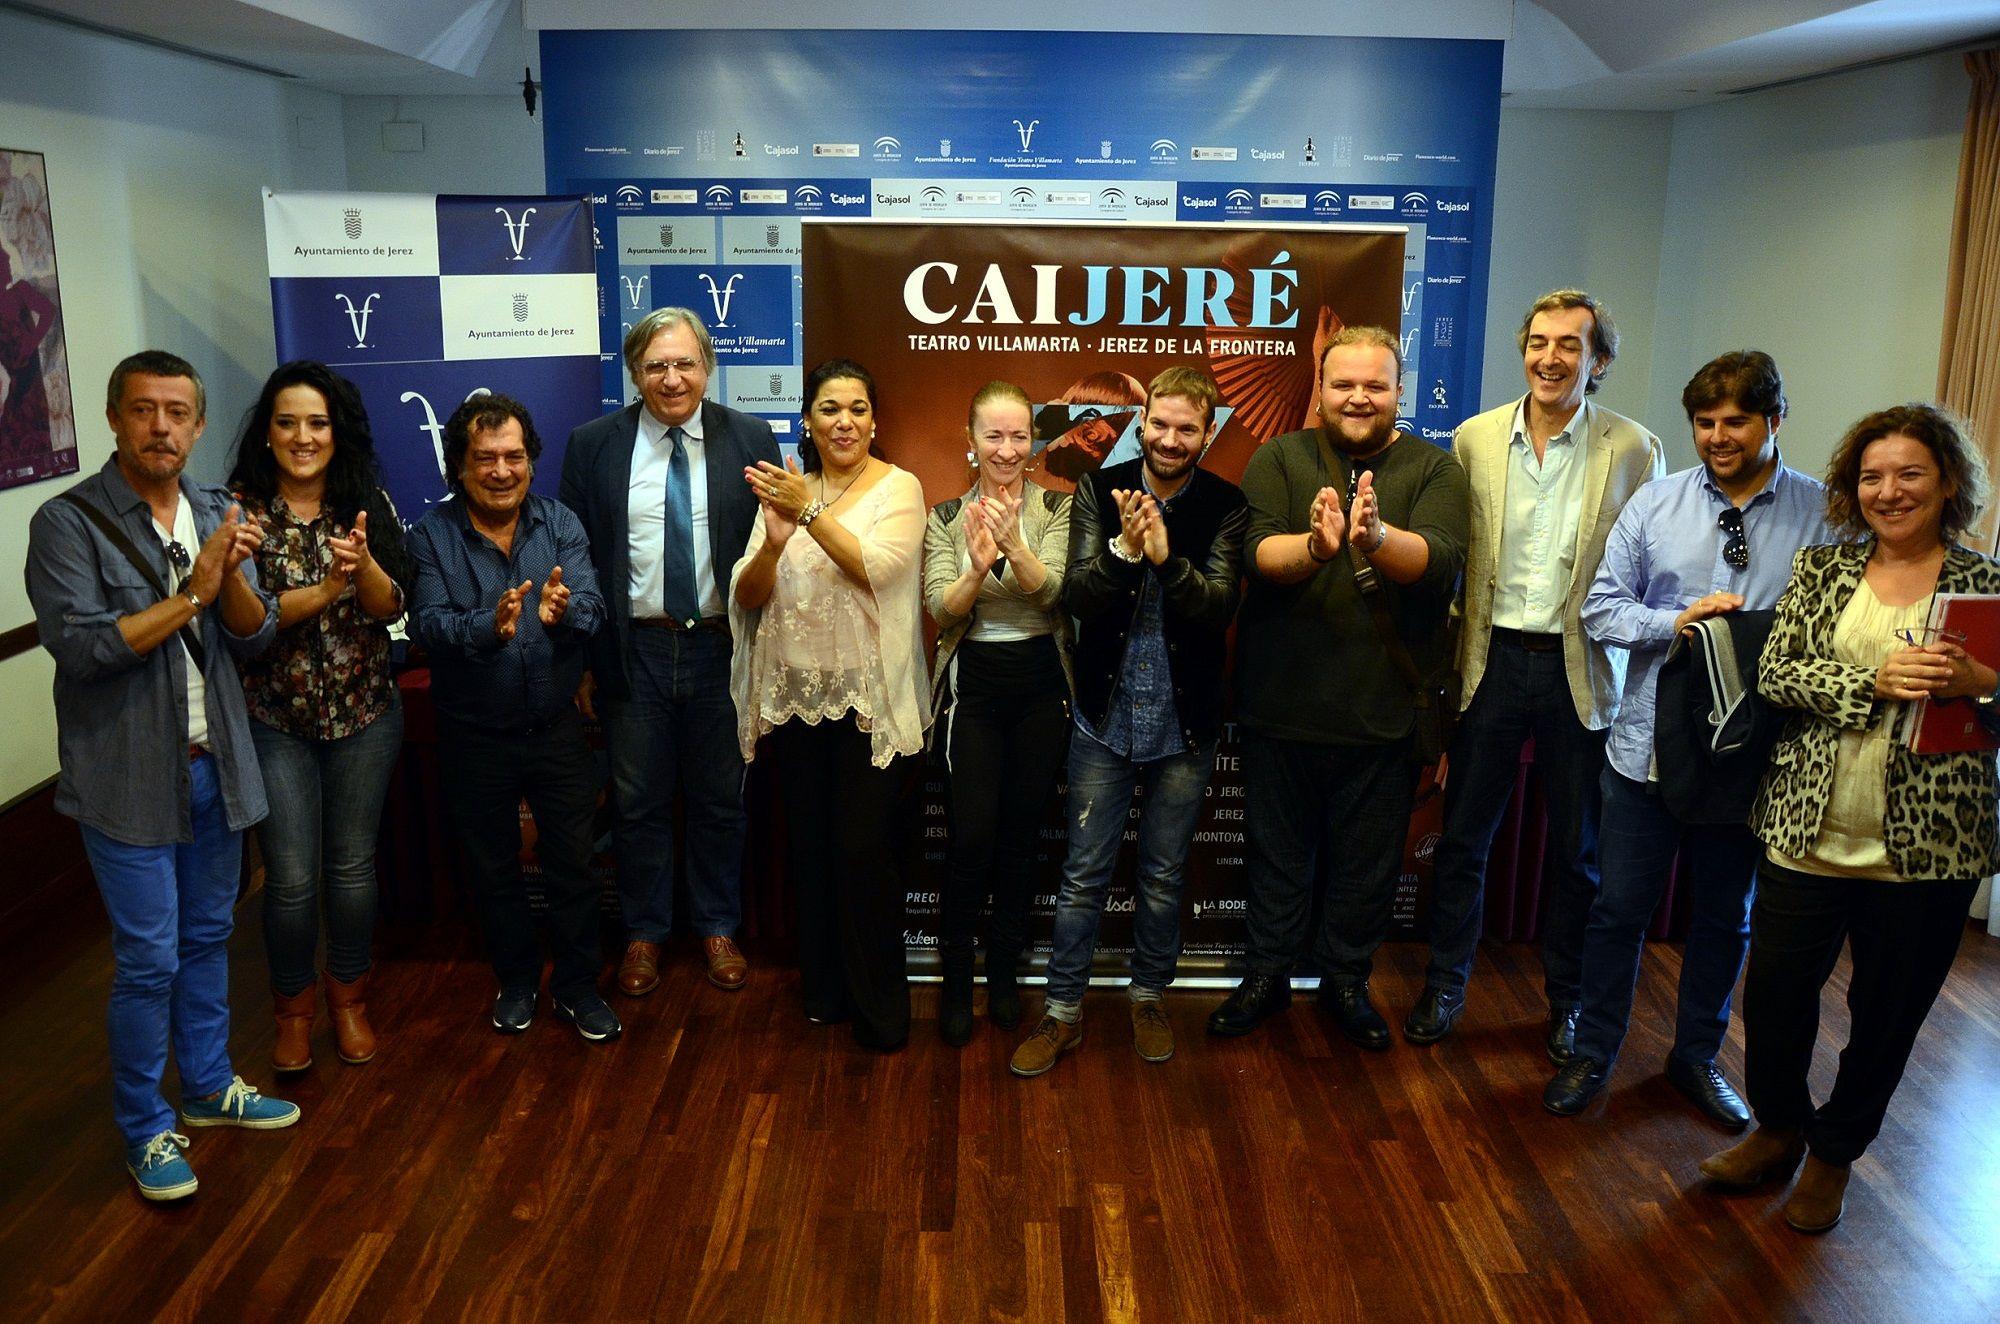 Caijere1